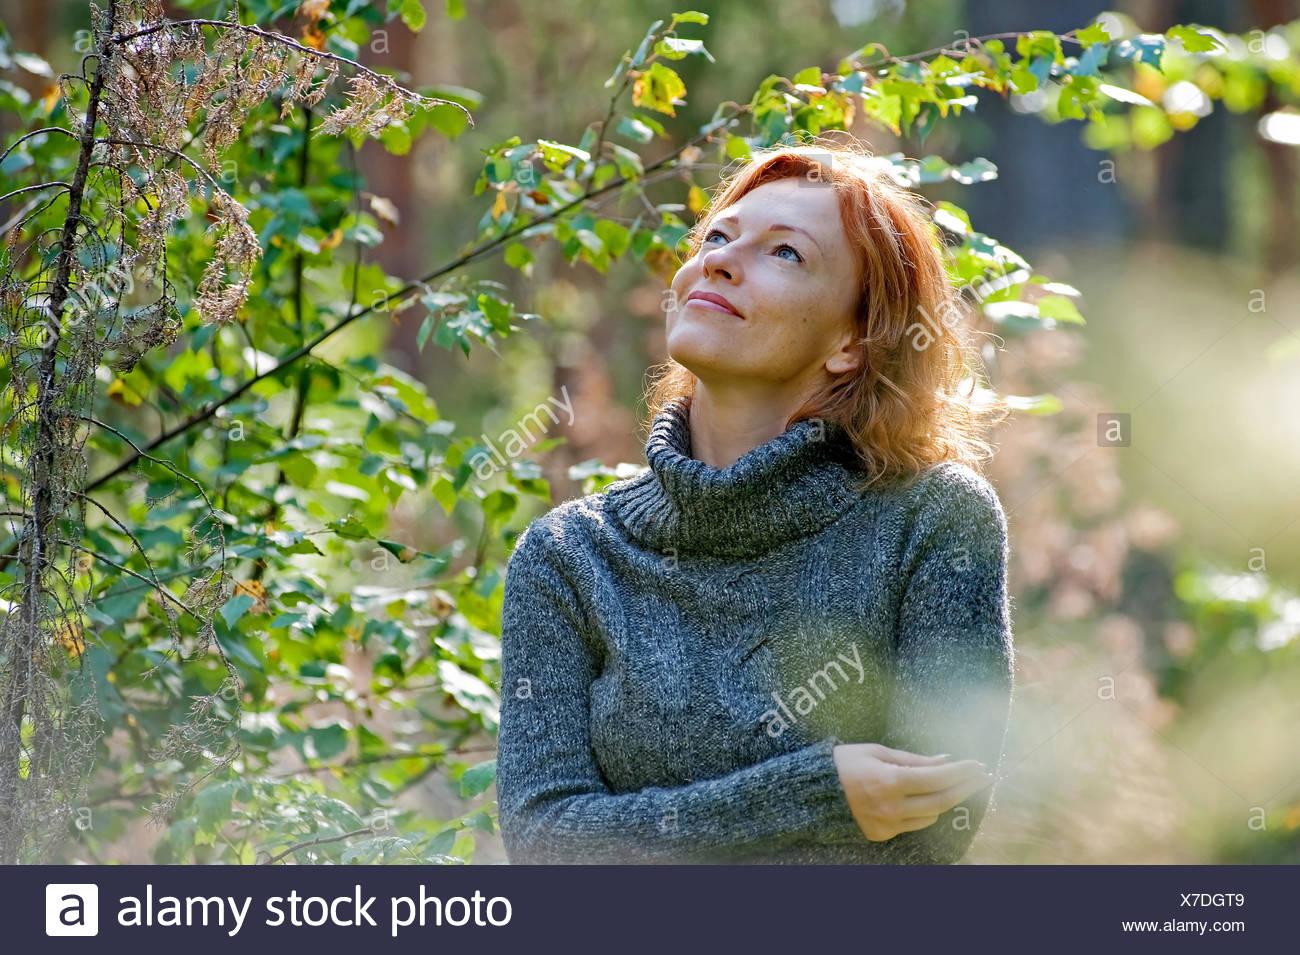 woman nature fashion beauty mature mode frau natur women adult